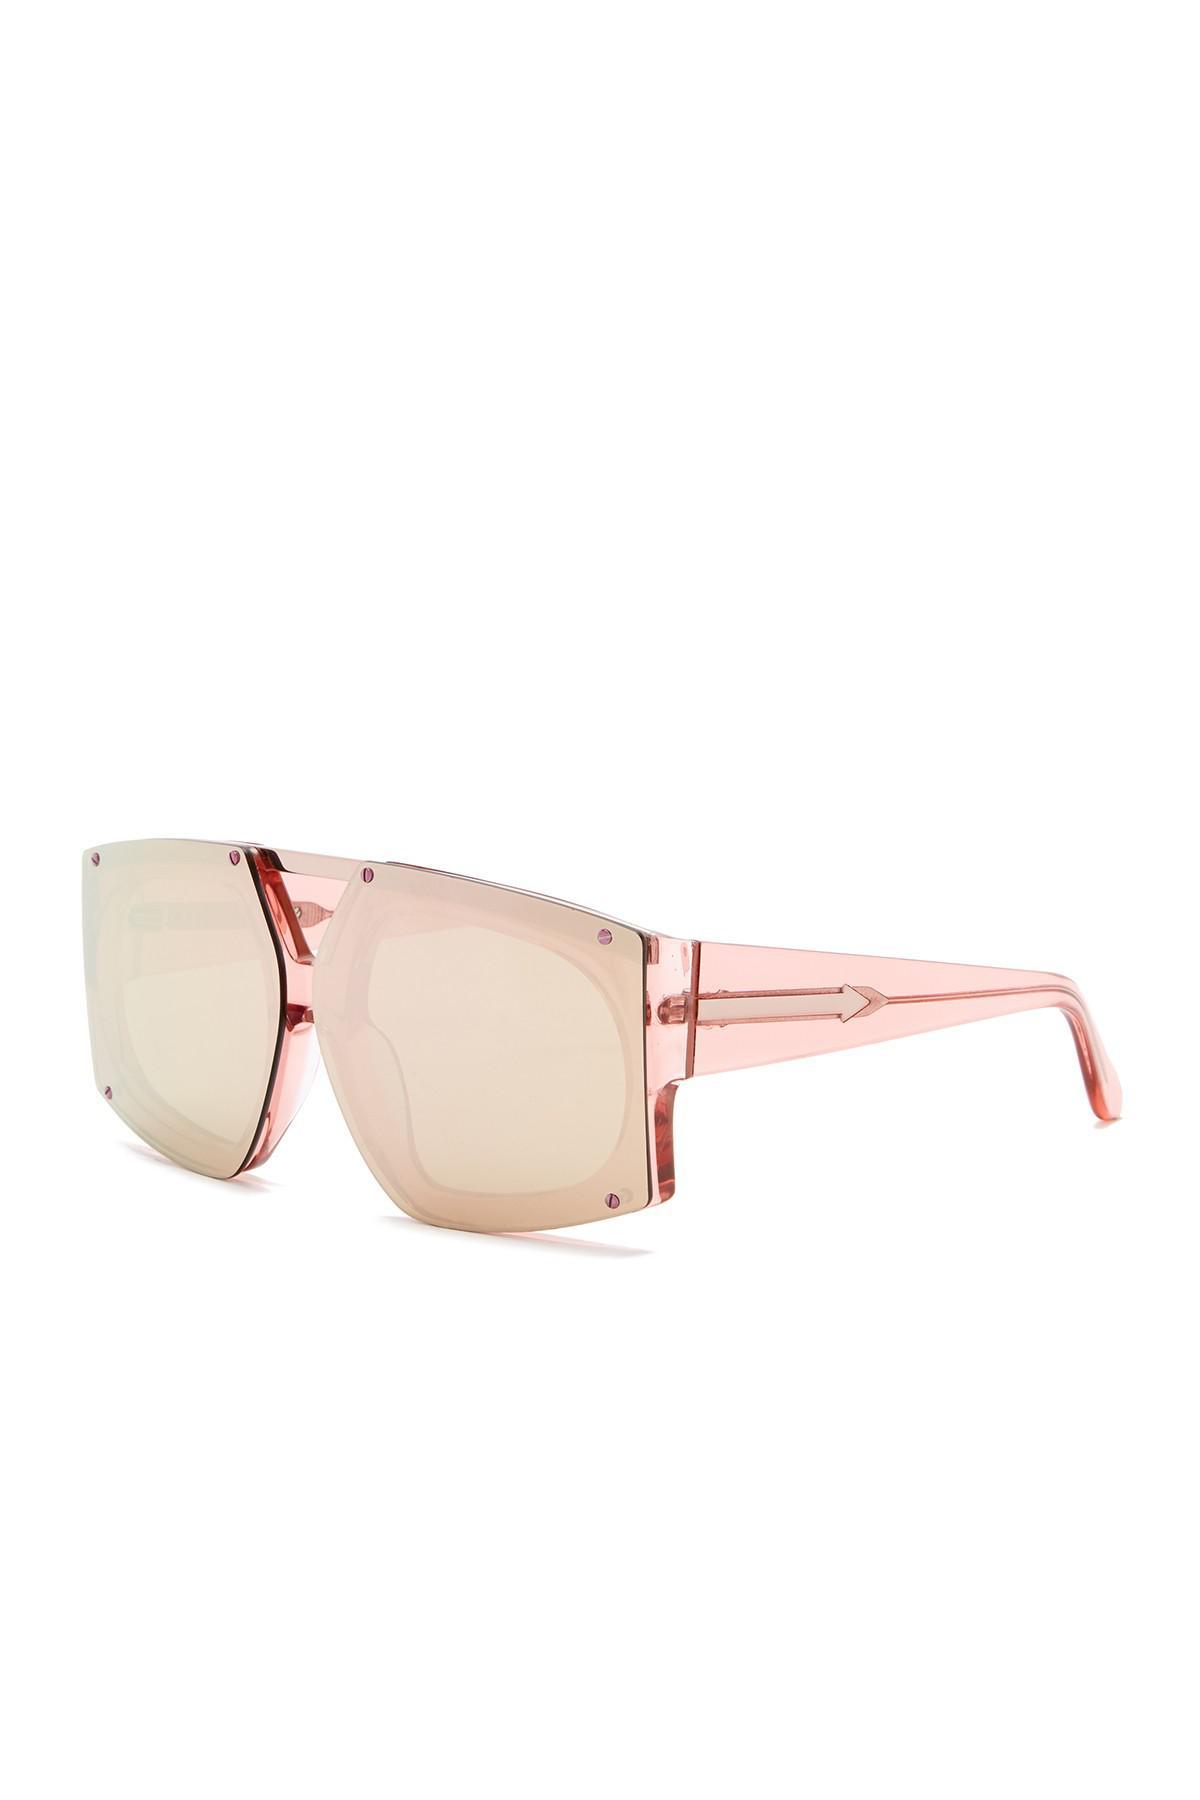 eb7f7df105f0 Lyst - Karen Walker 70mm Salvador Wrap Sunglasses in Pink